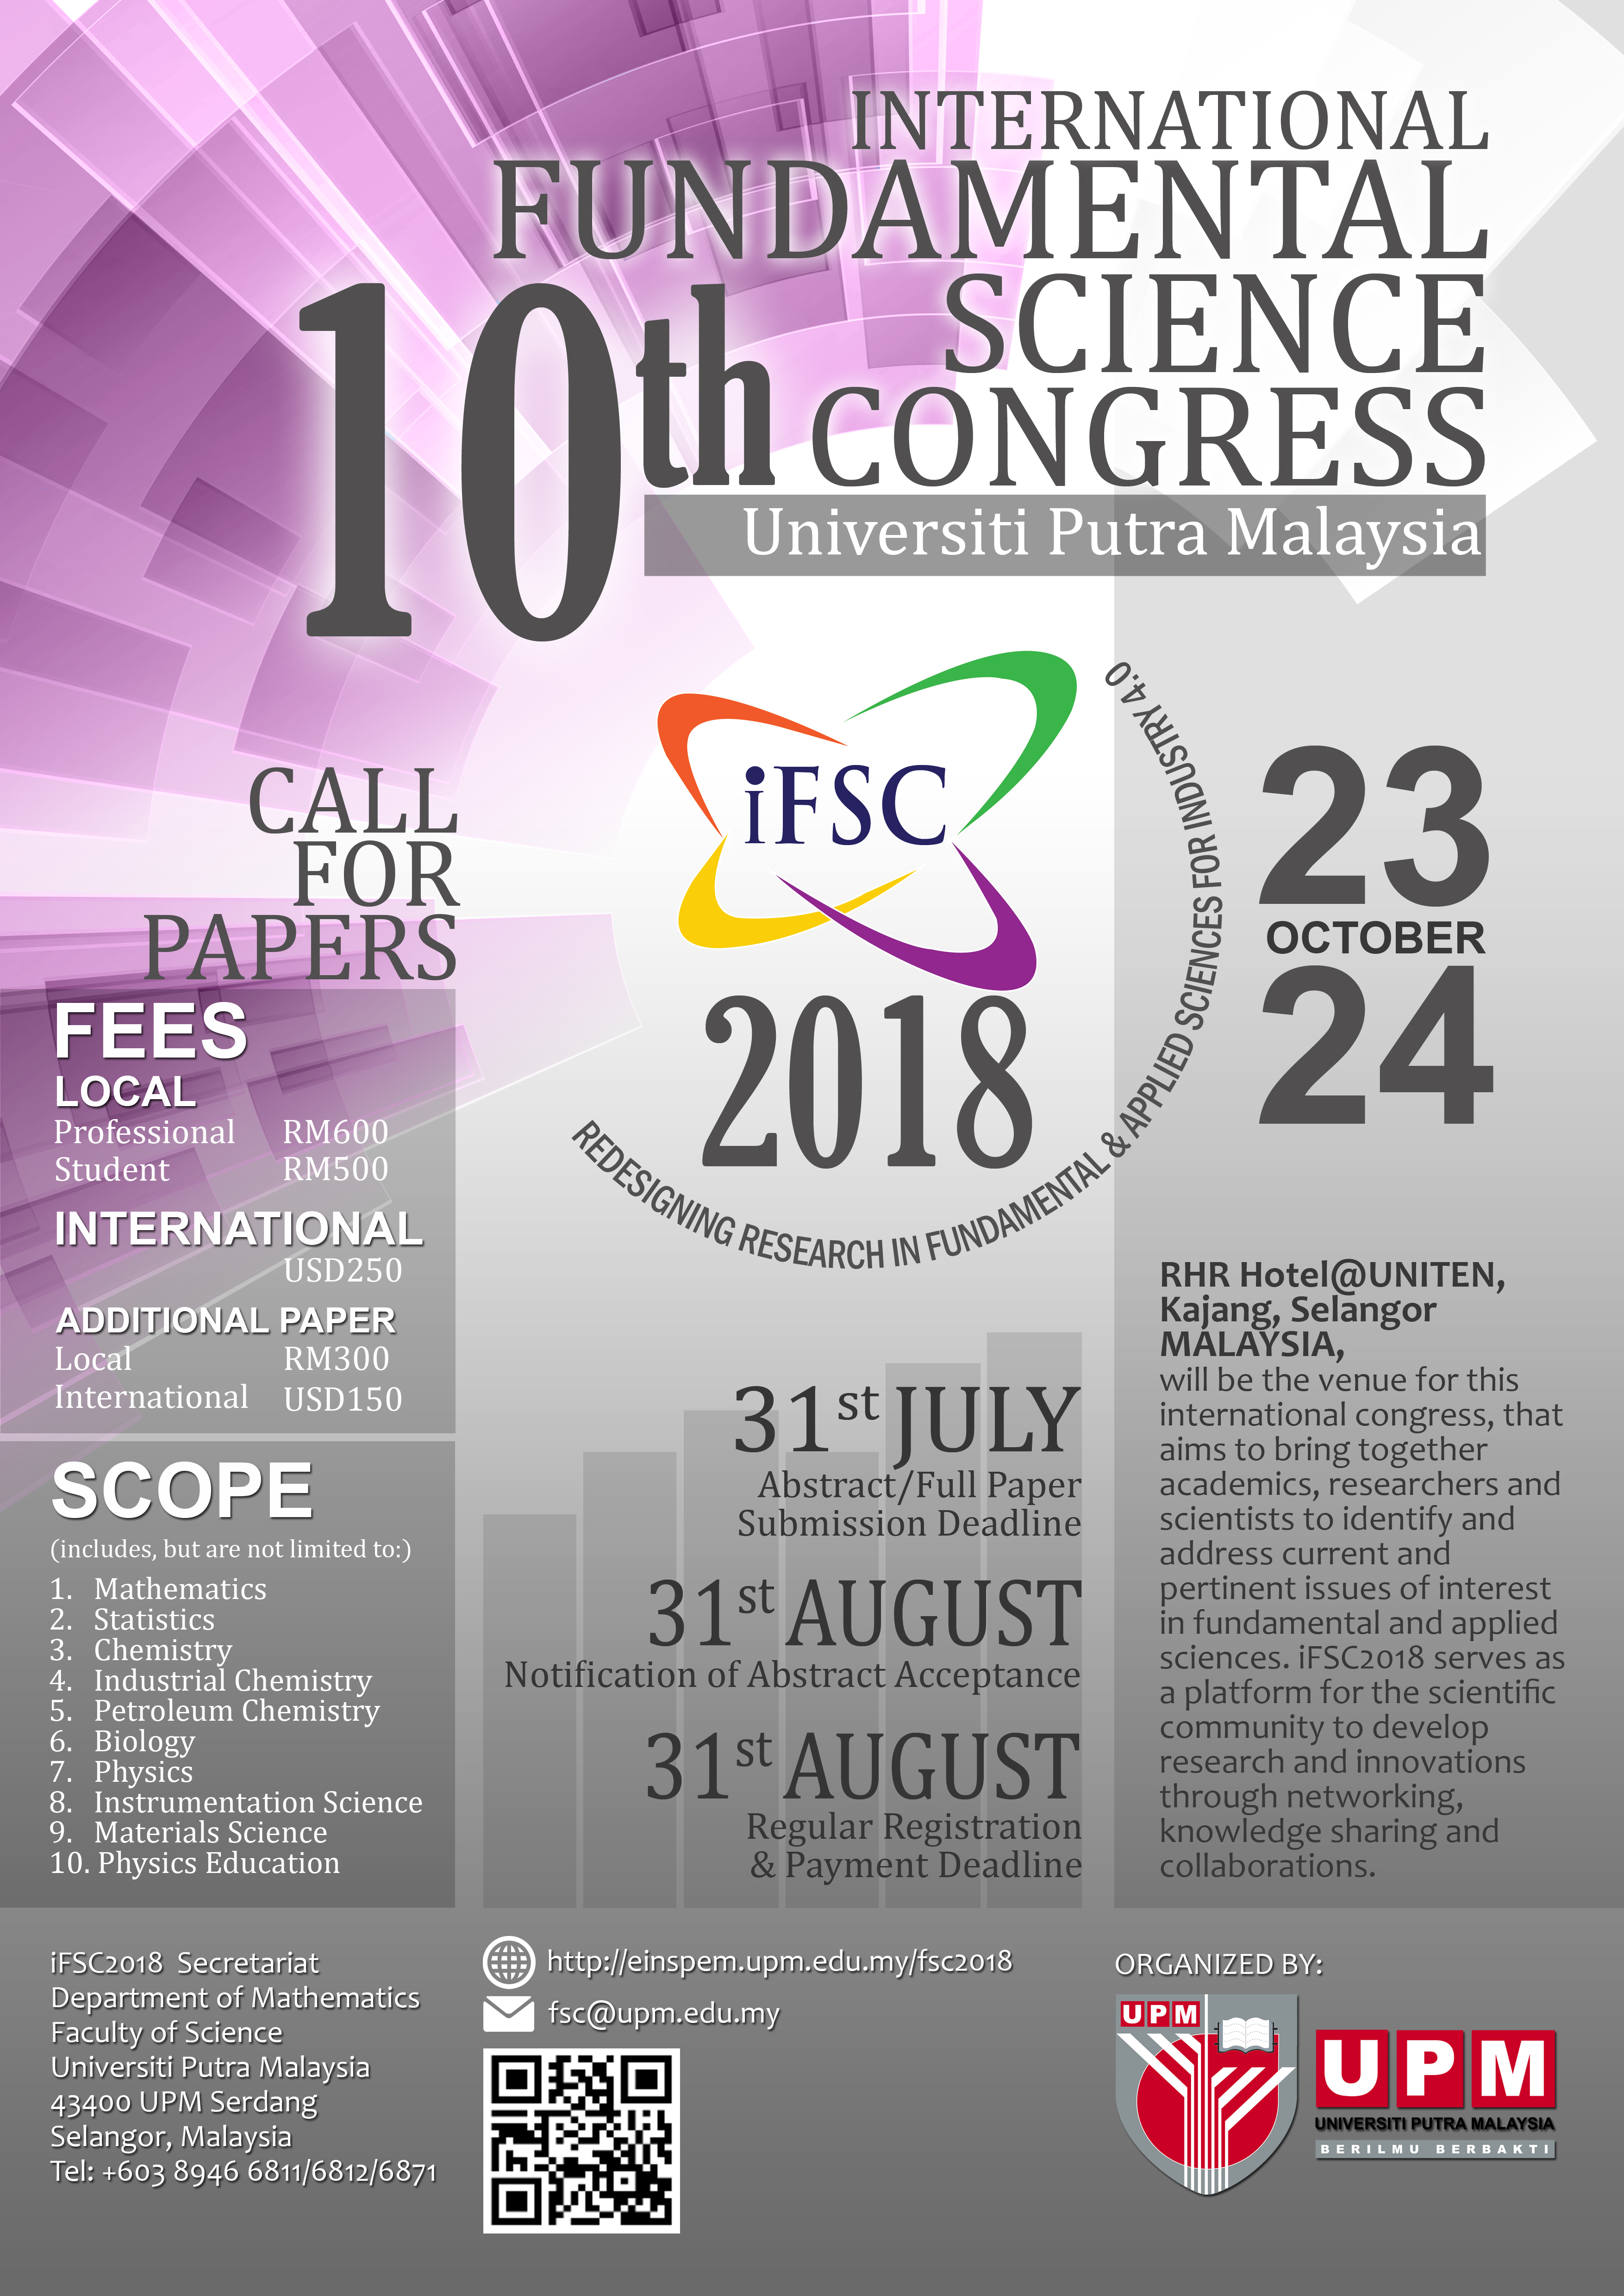 Fundamental science congress 2018 first announcement toneelgroepblik Images